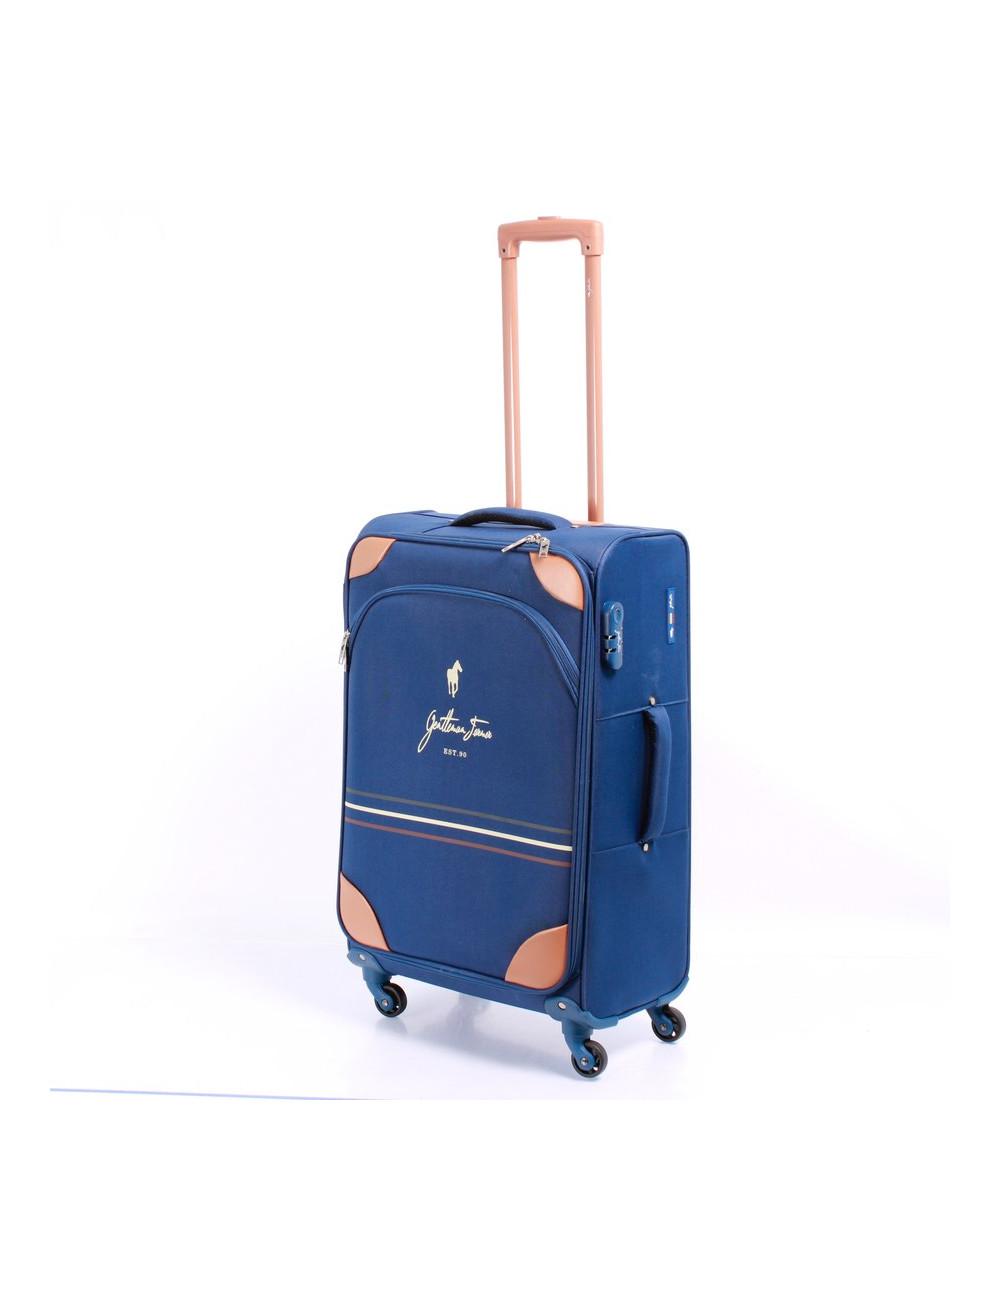 valise toile 4 roulettes